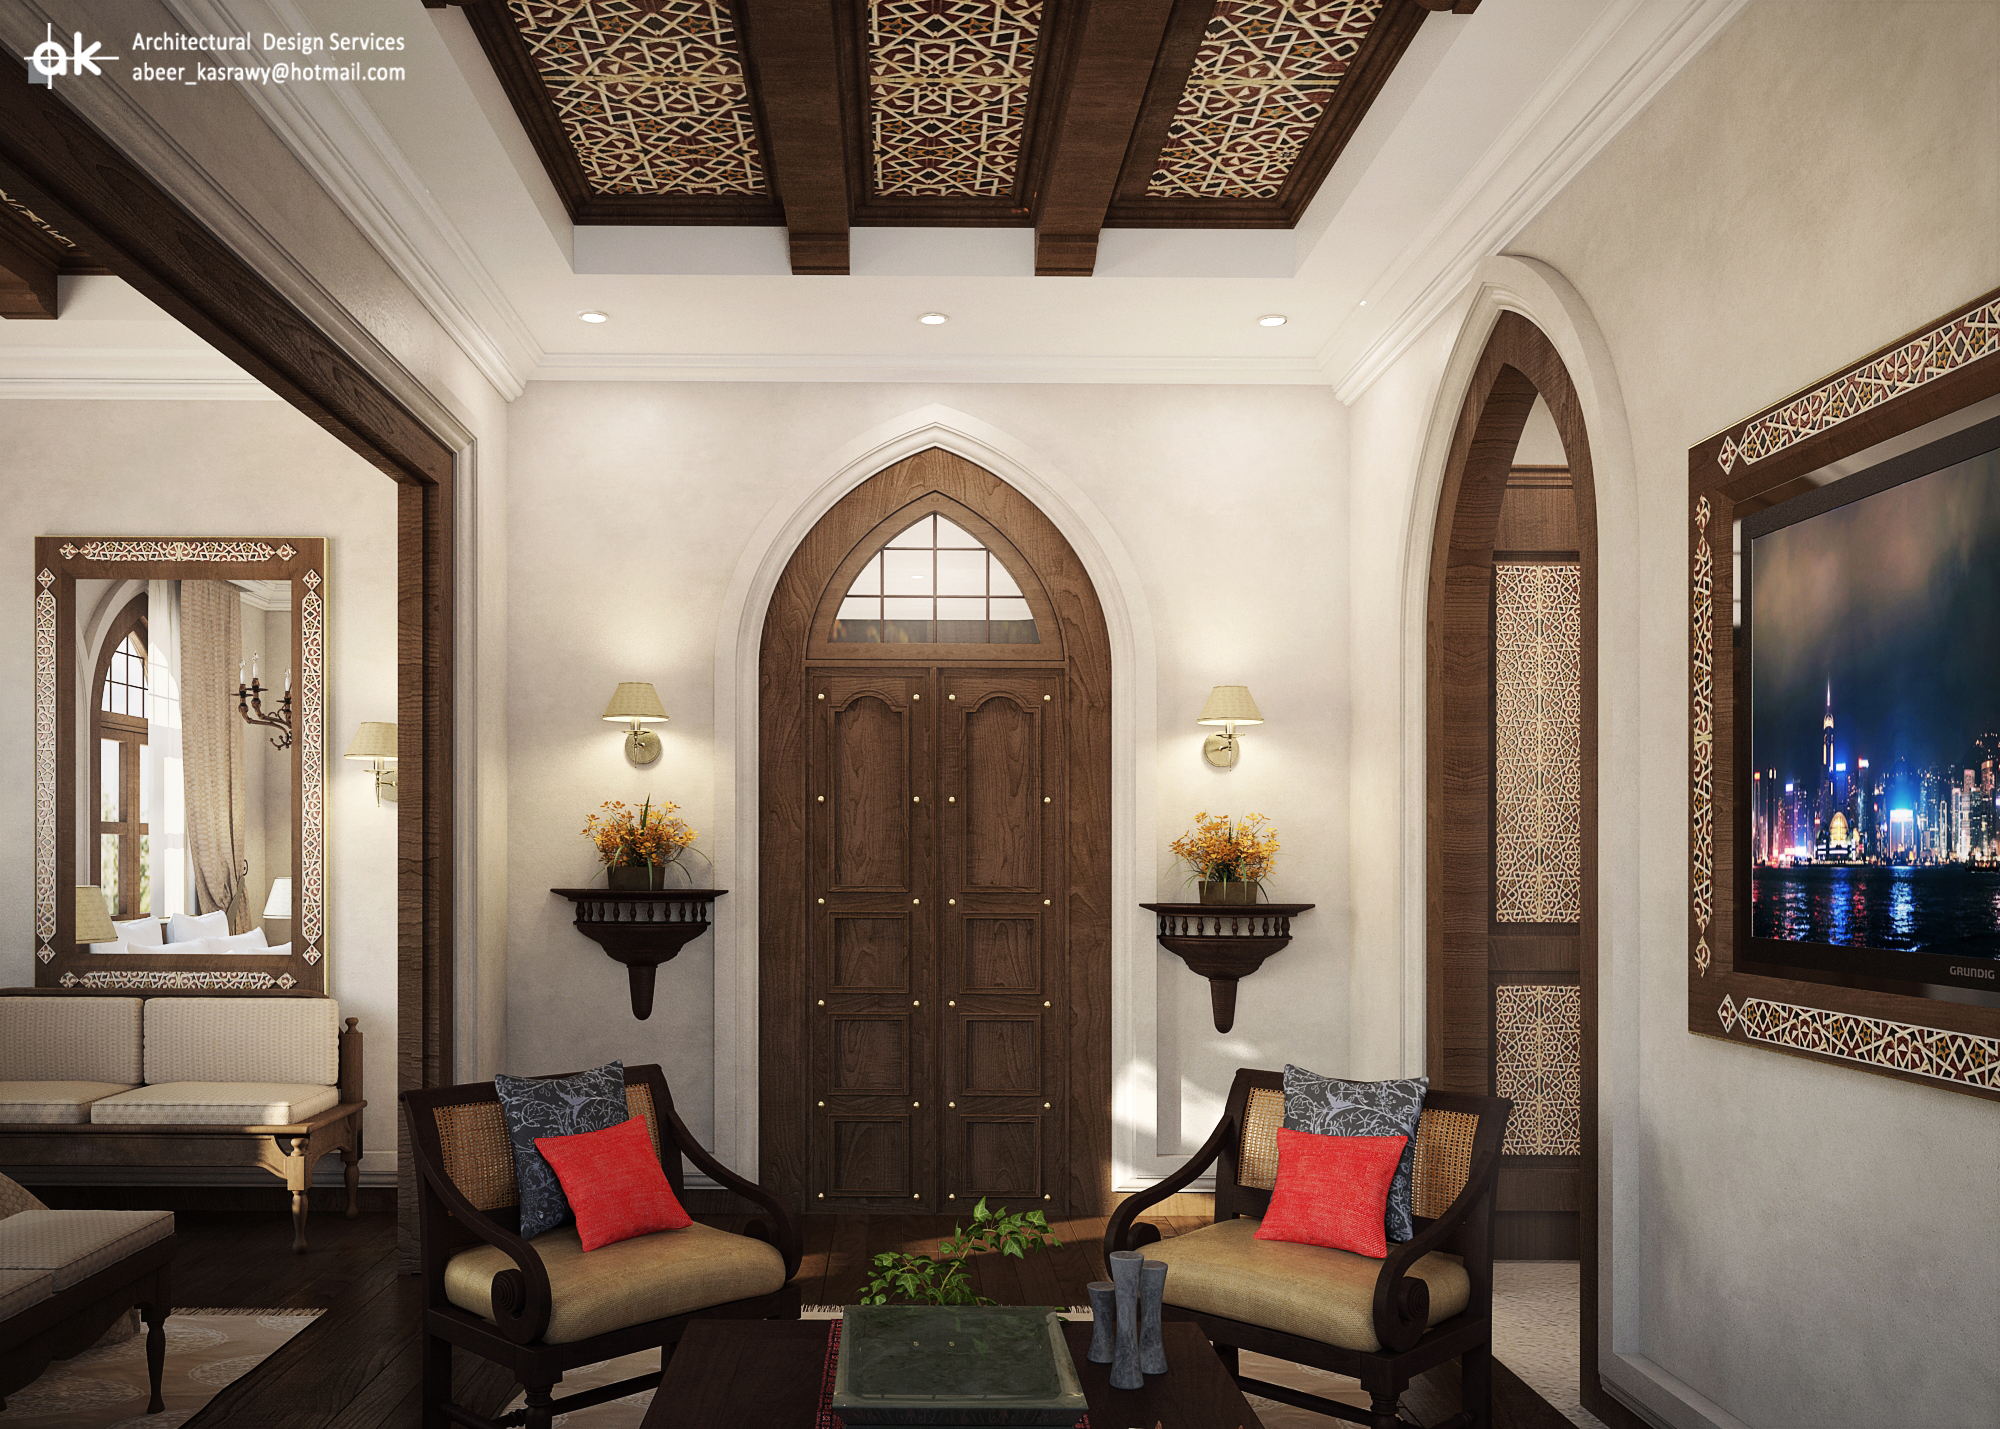 KSA Boutique hotel - Interior 2 by kasrawy